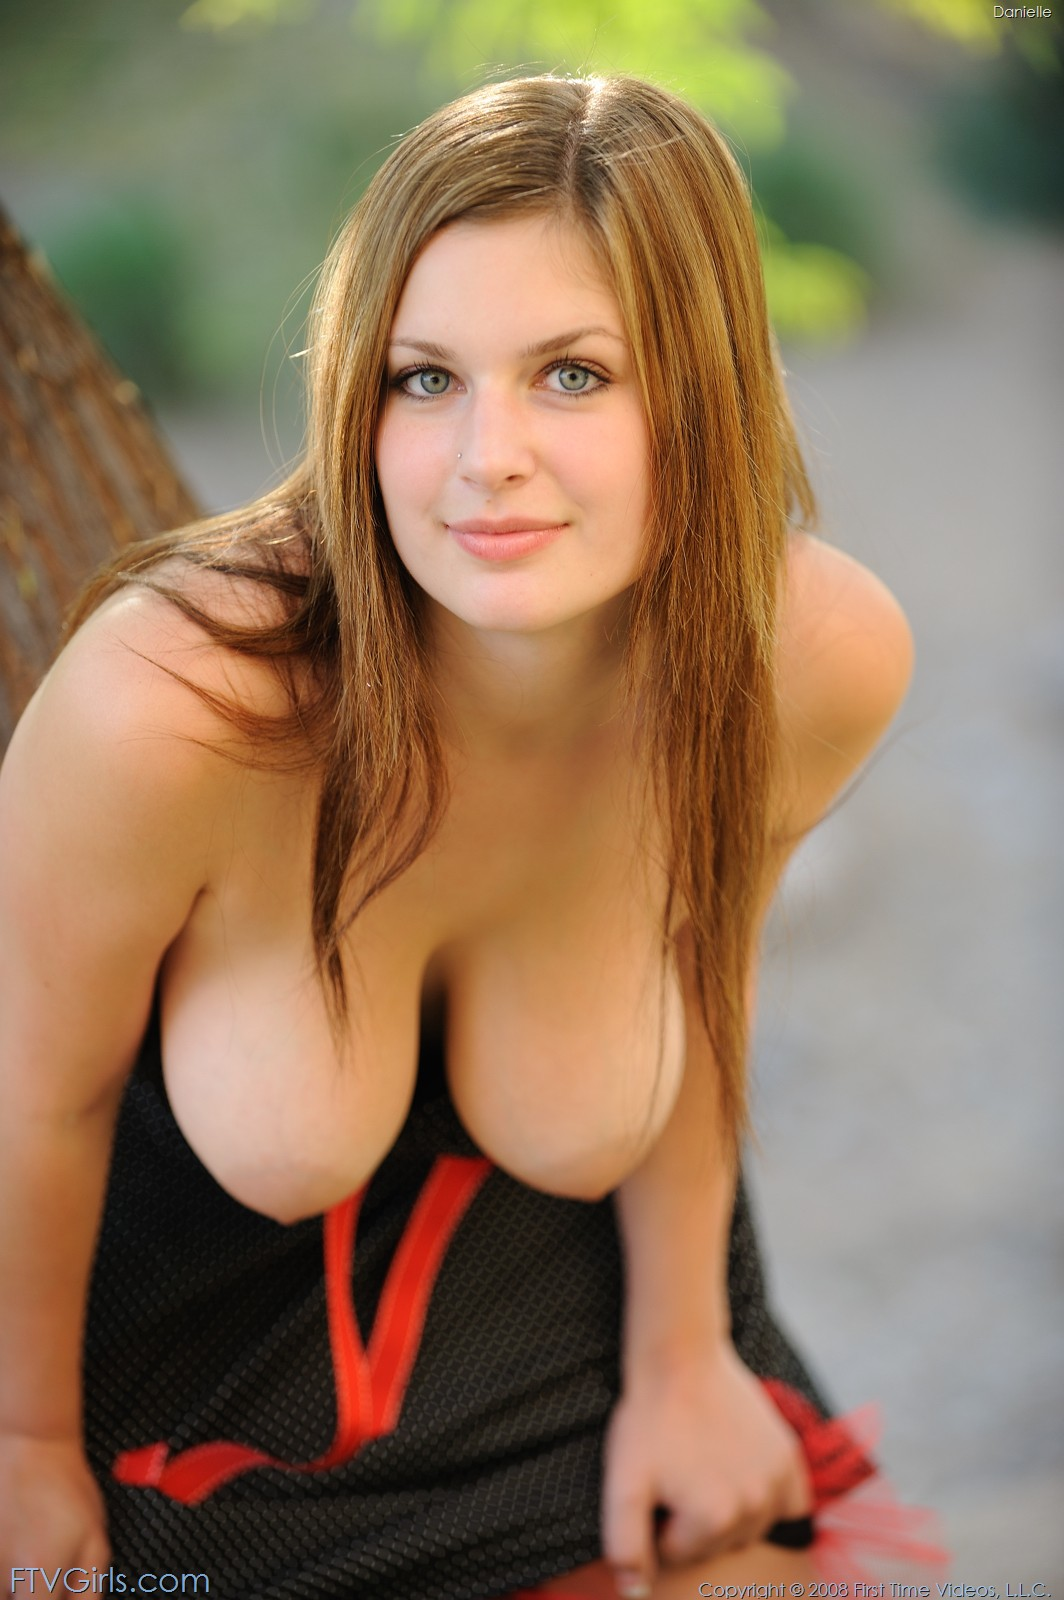 Danielleftv